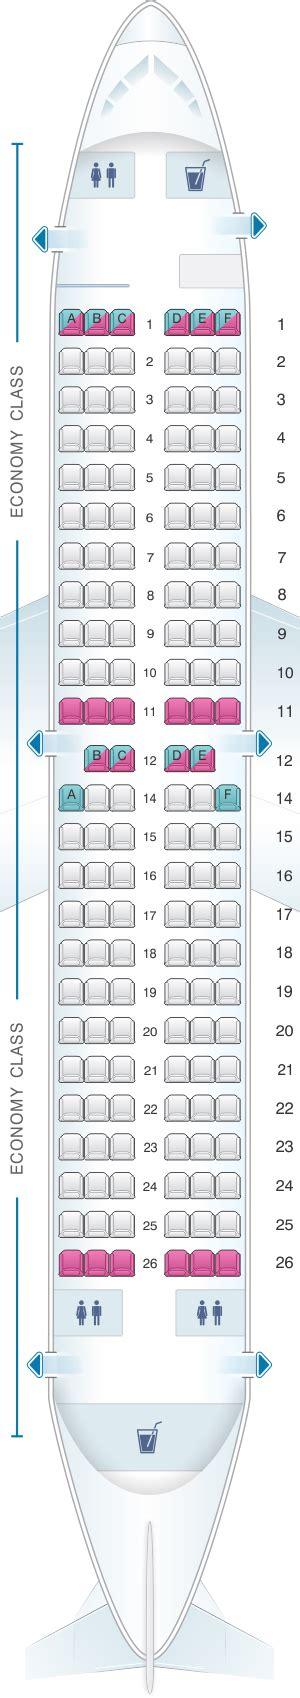 boeing 737 plan sieges plan de cabine tuifly boeing b737 300 seatmaestro fr